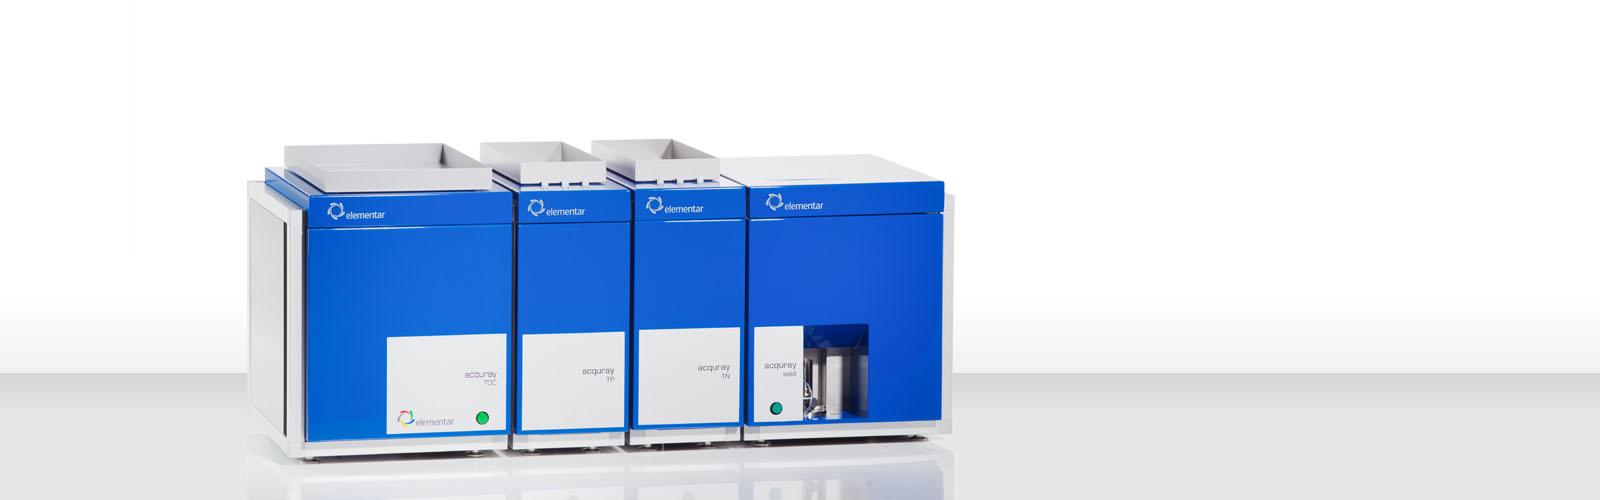 elementar水质分析仪 TOC分析仪 acquray 系列